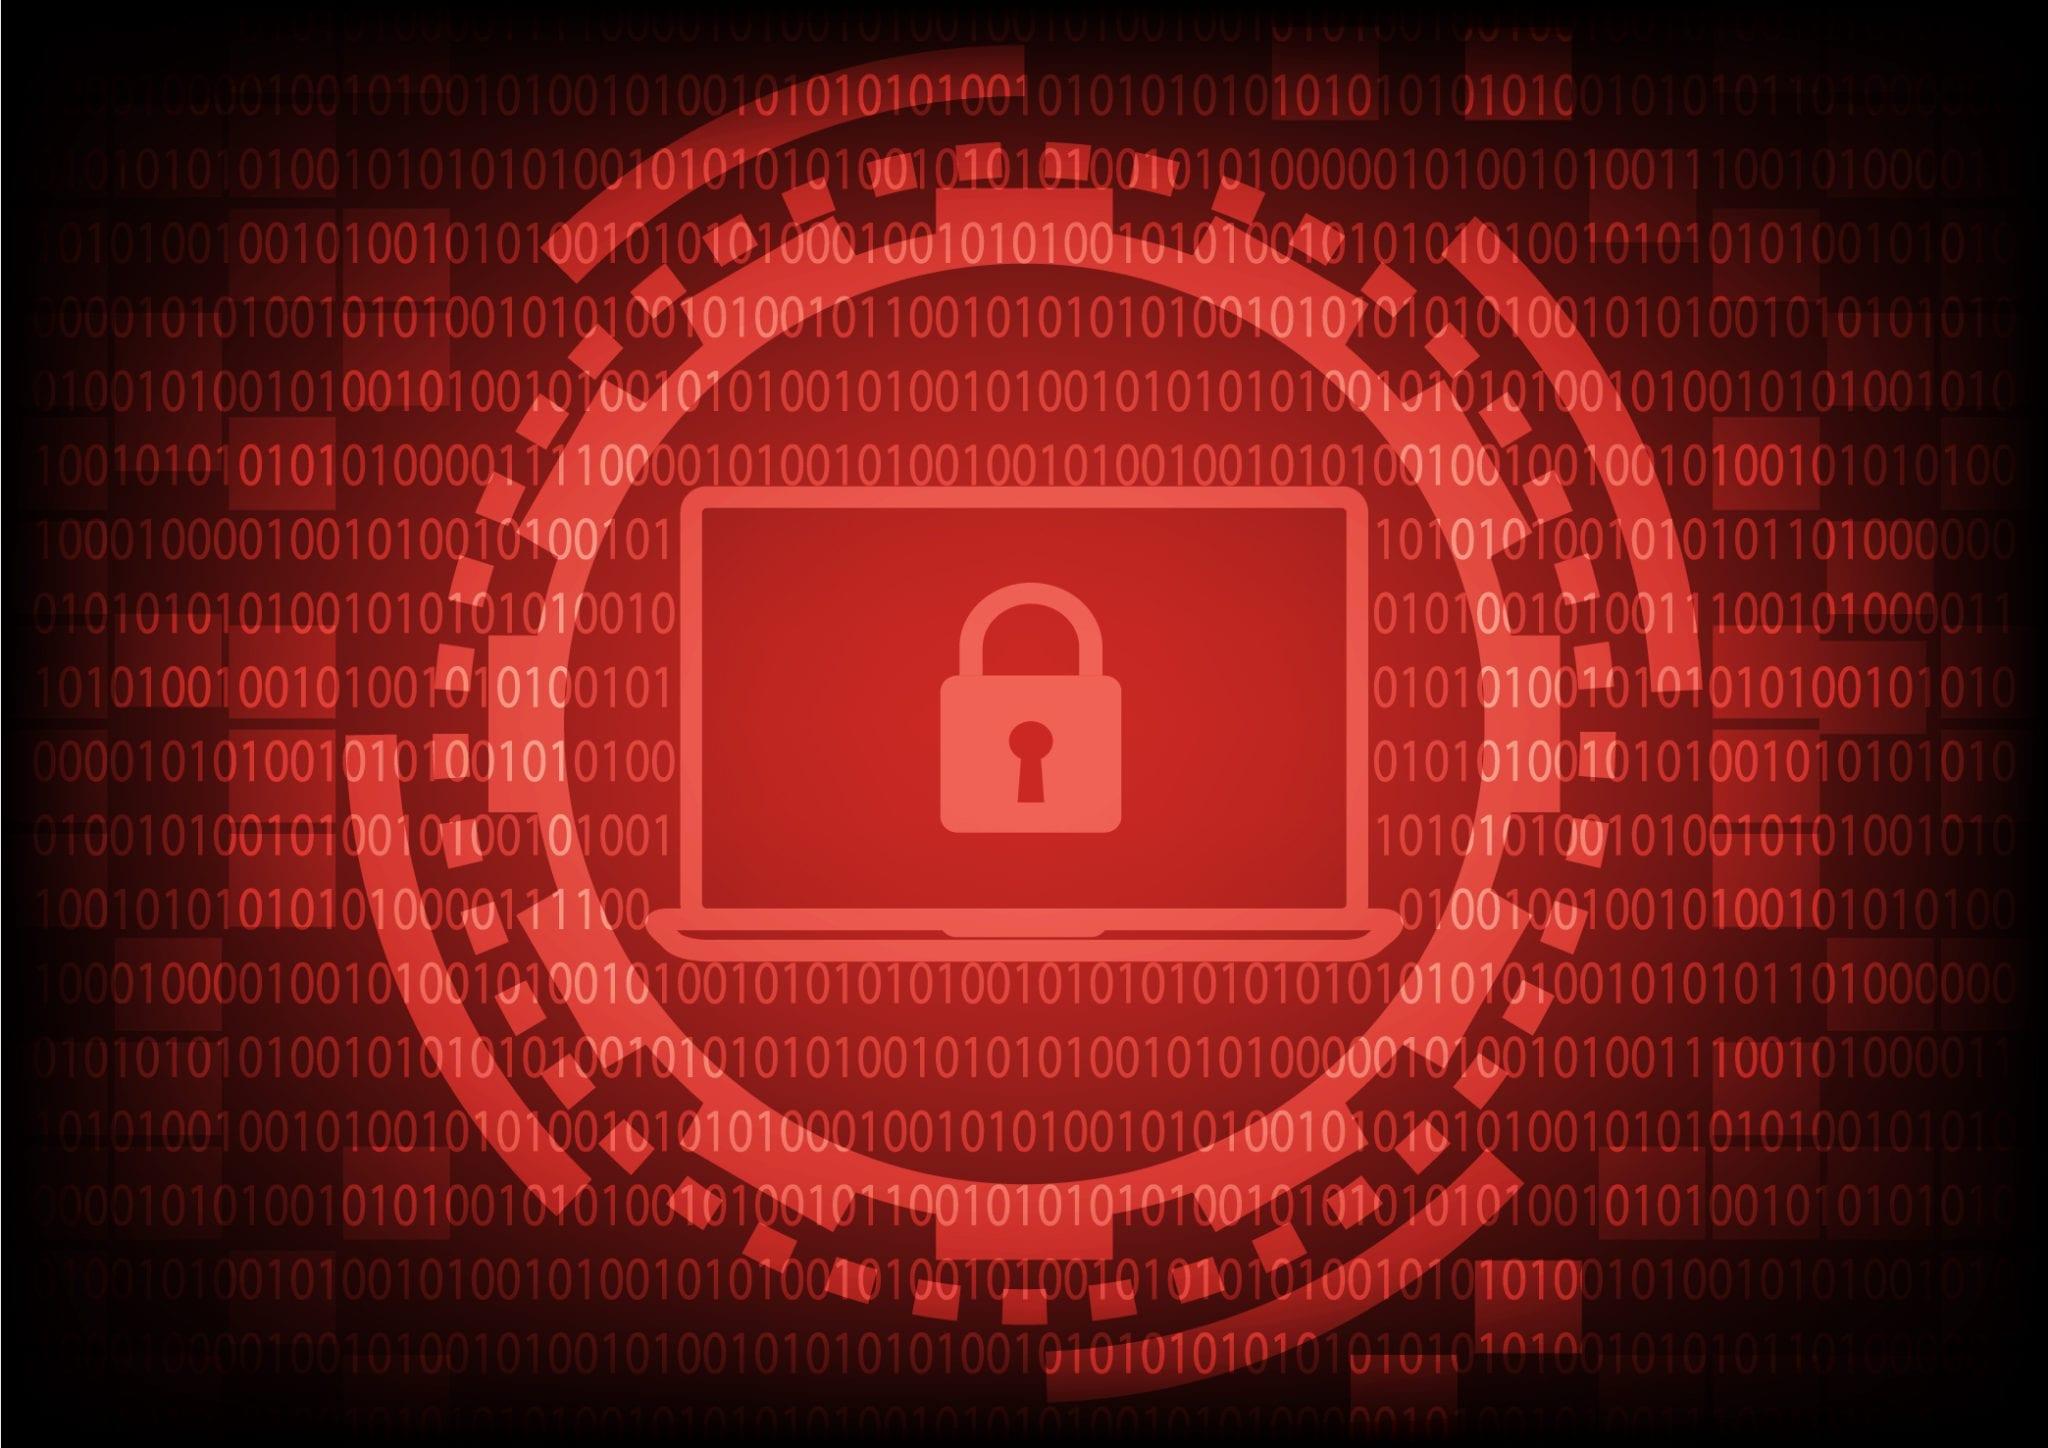 hundreds-of-thousands-of-wordpress-sites-defaced-through-rest-api-vulnerability.jpg